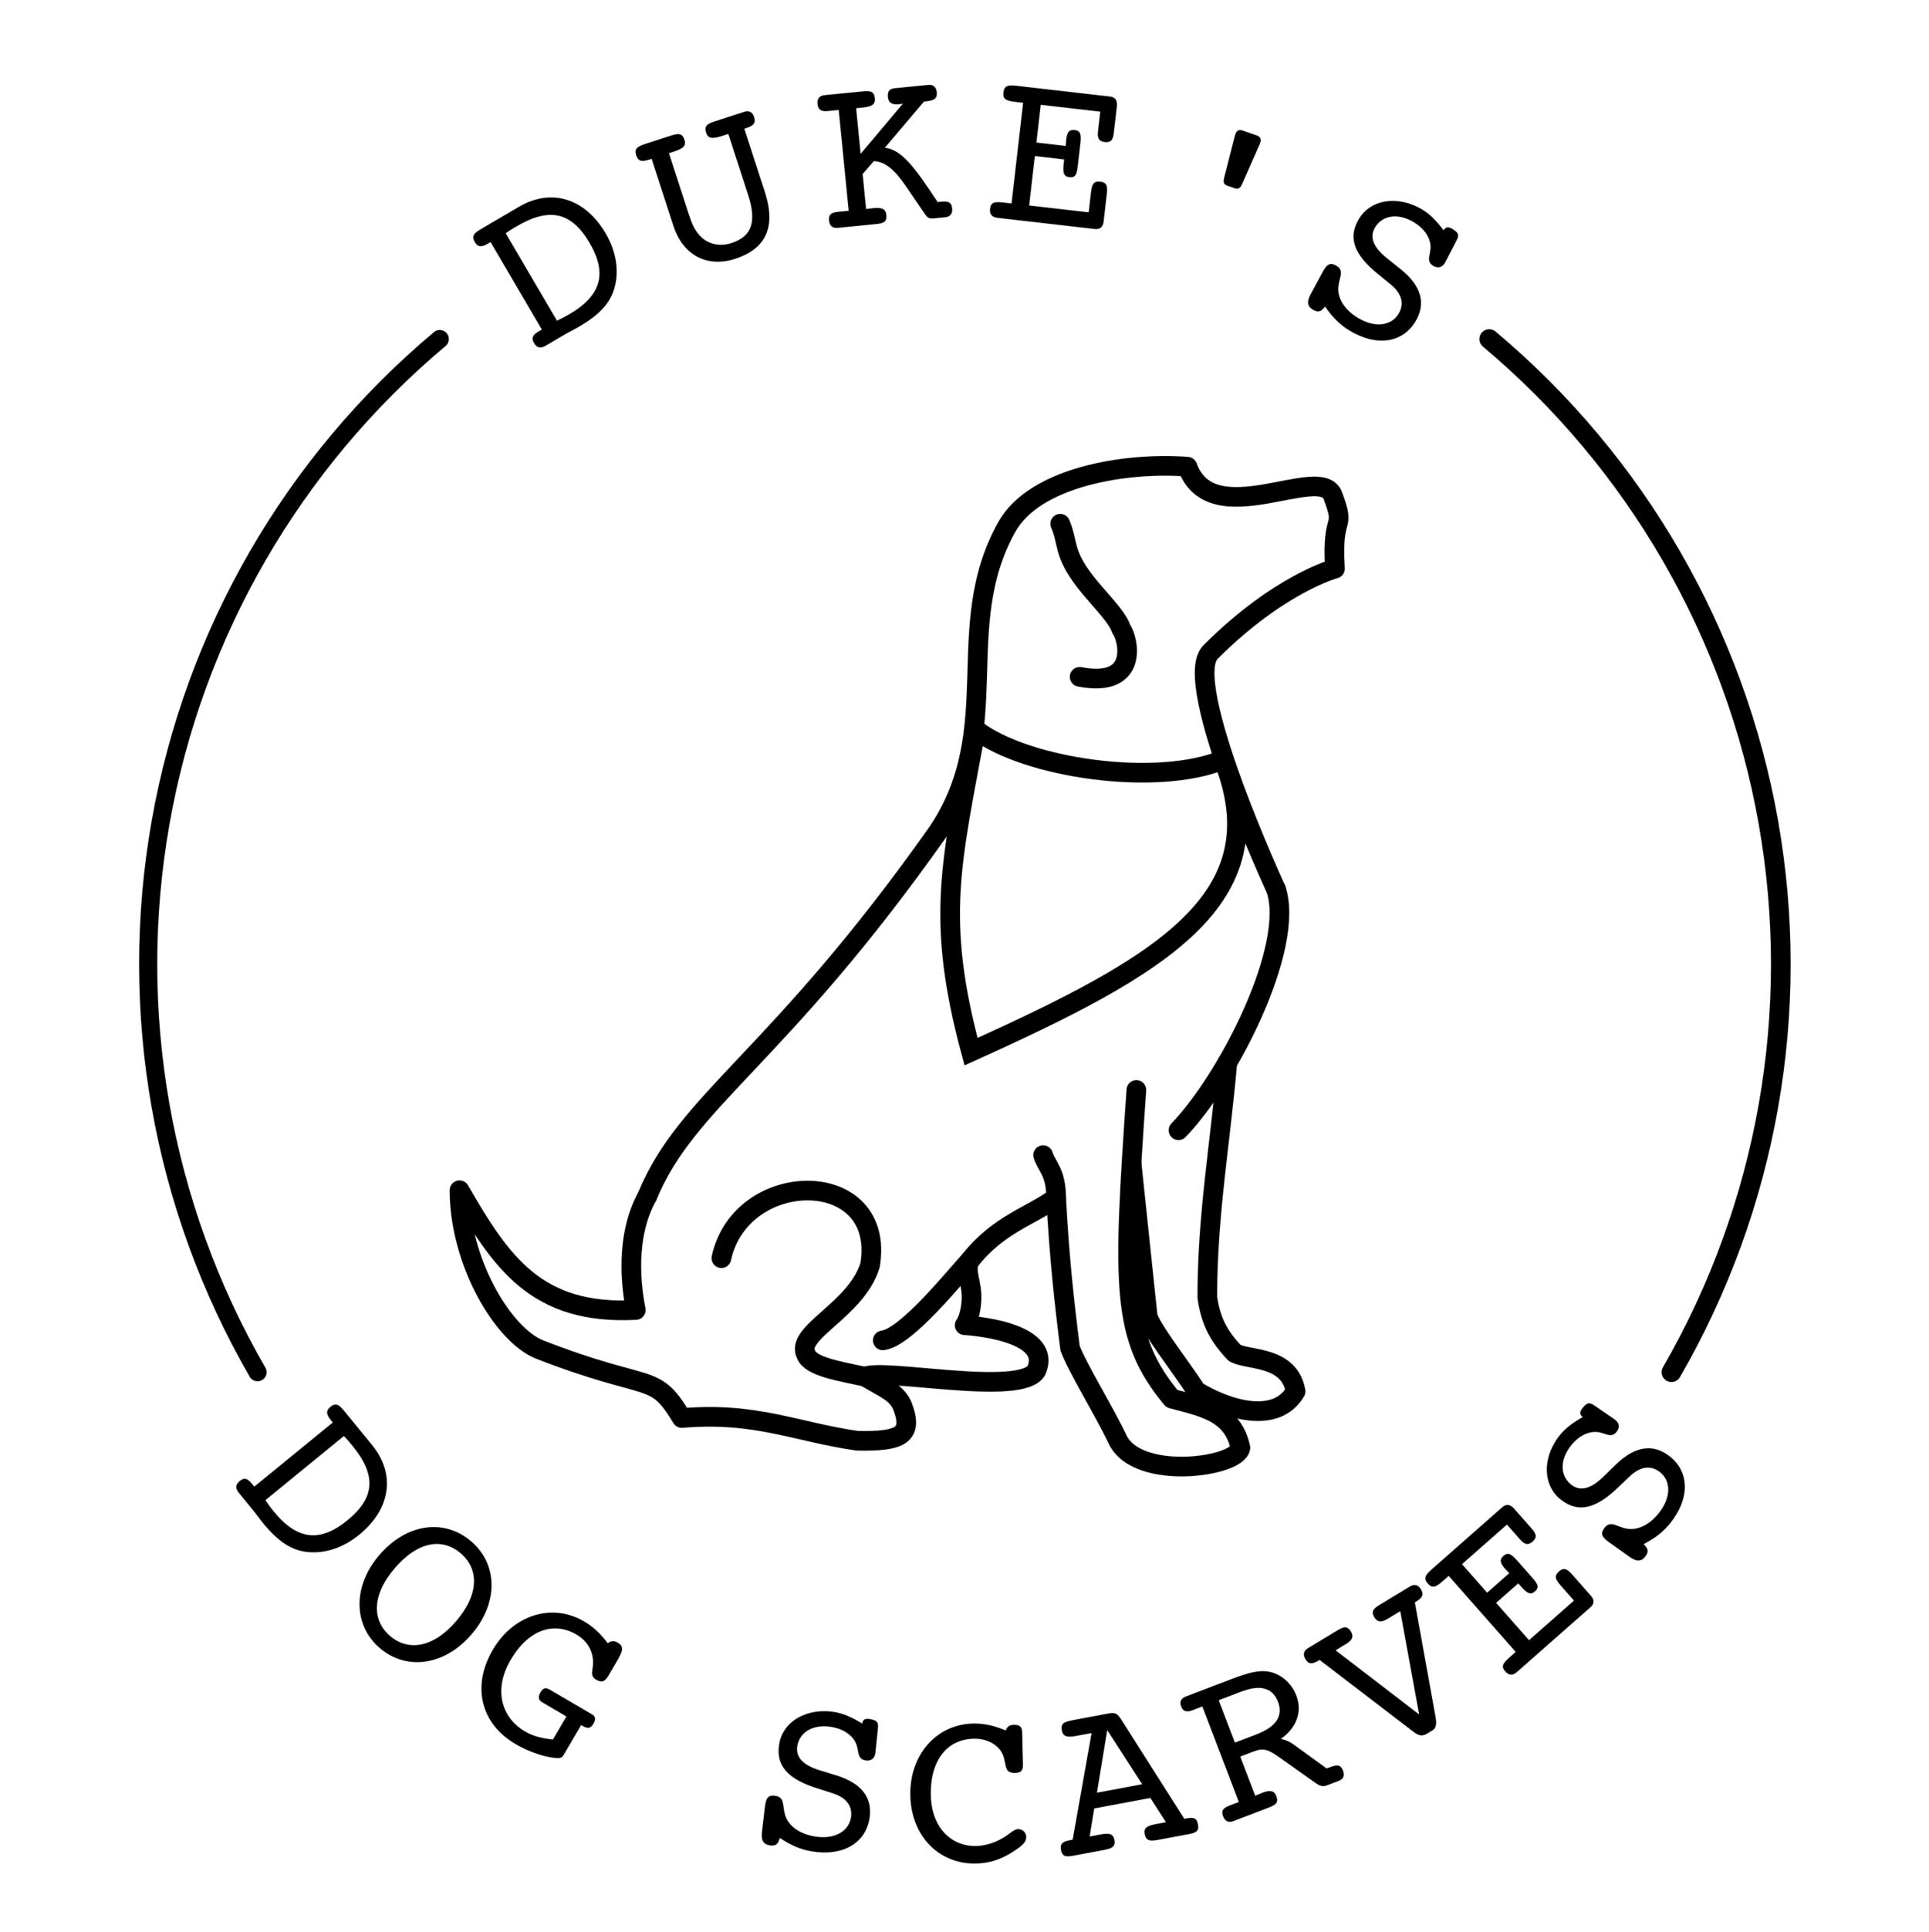 dukesdogscarves.png